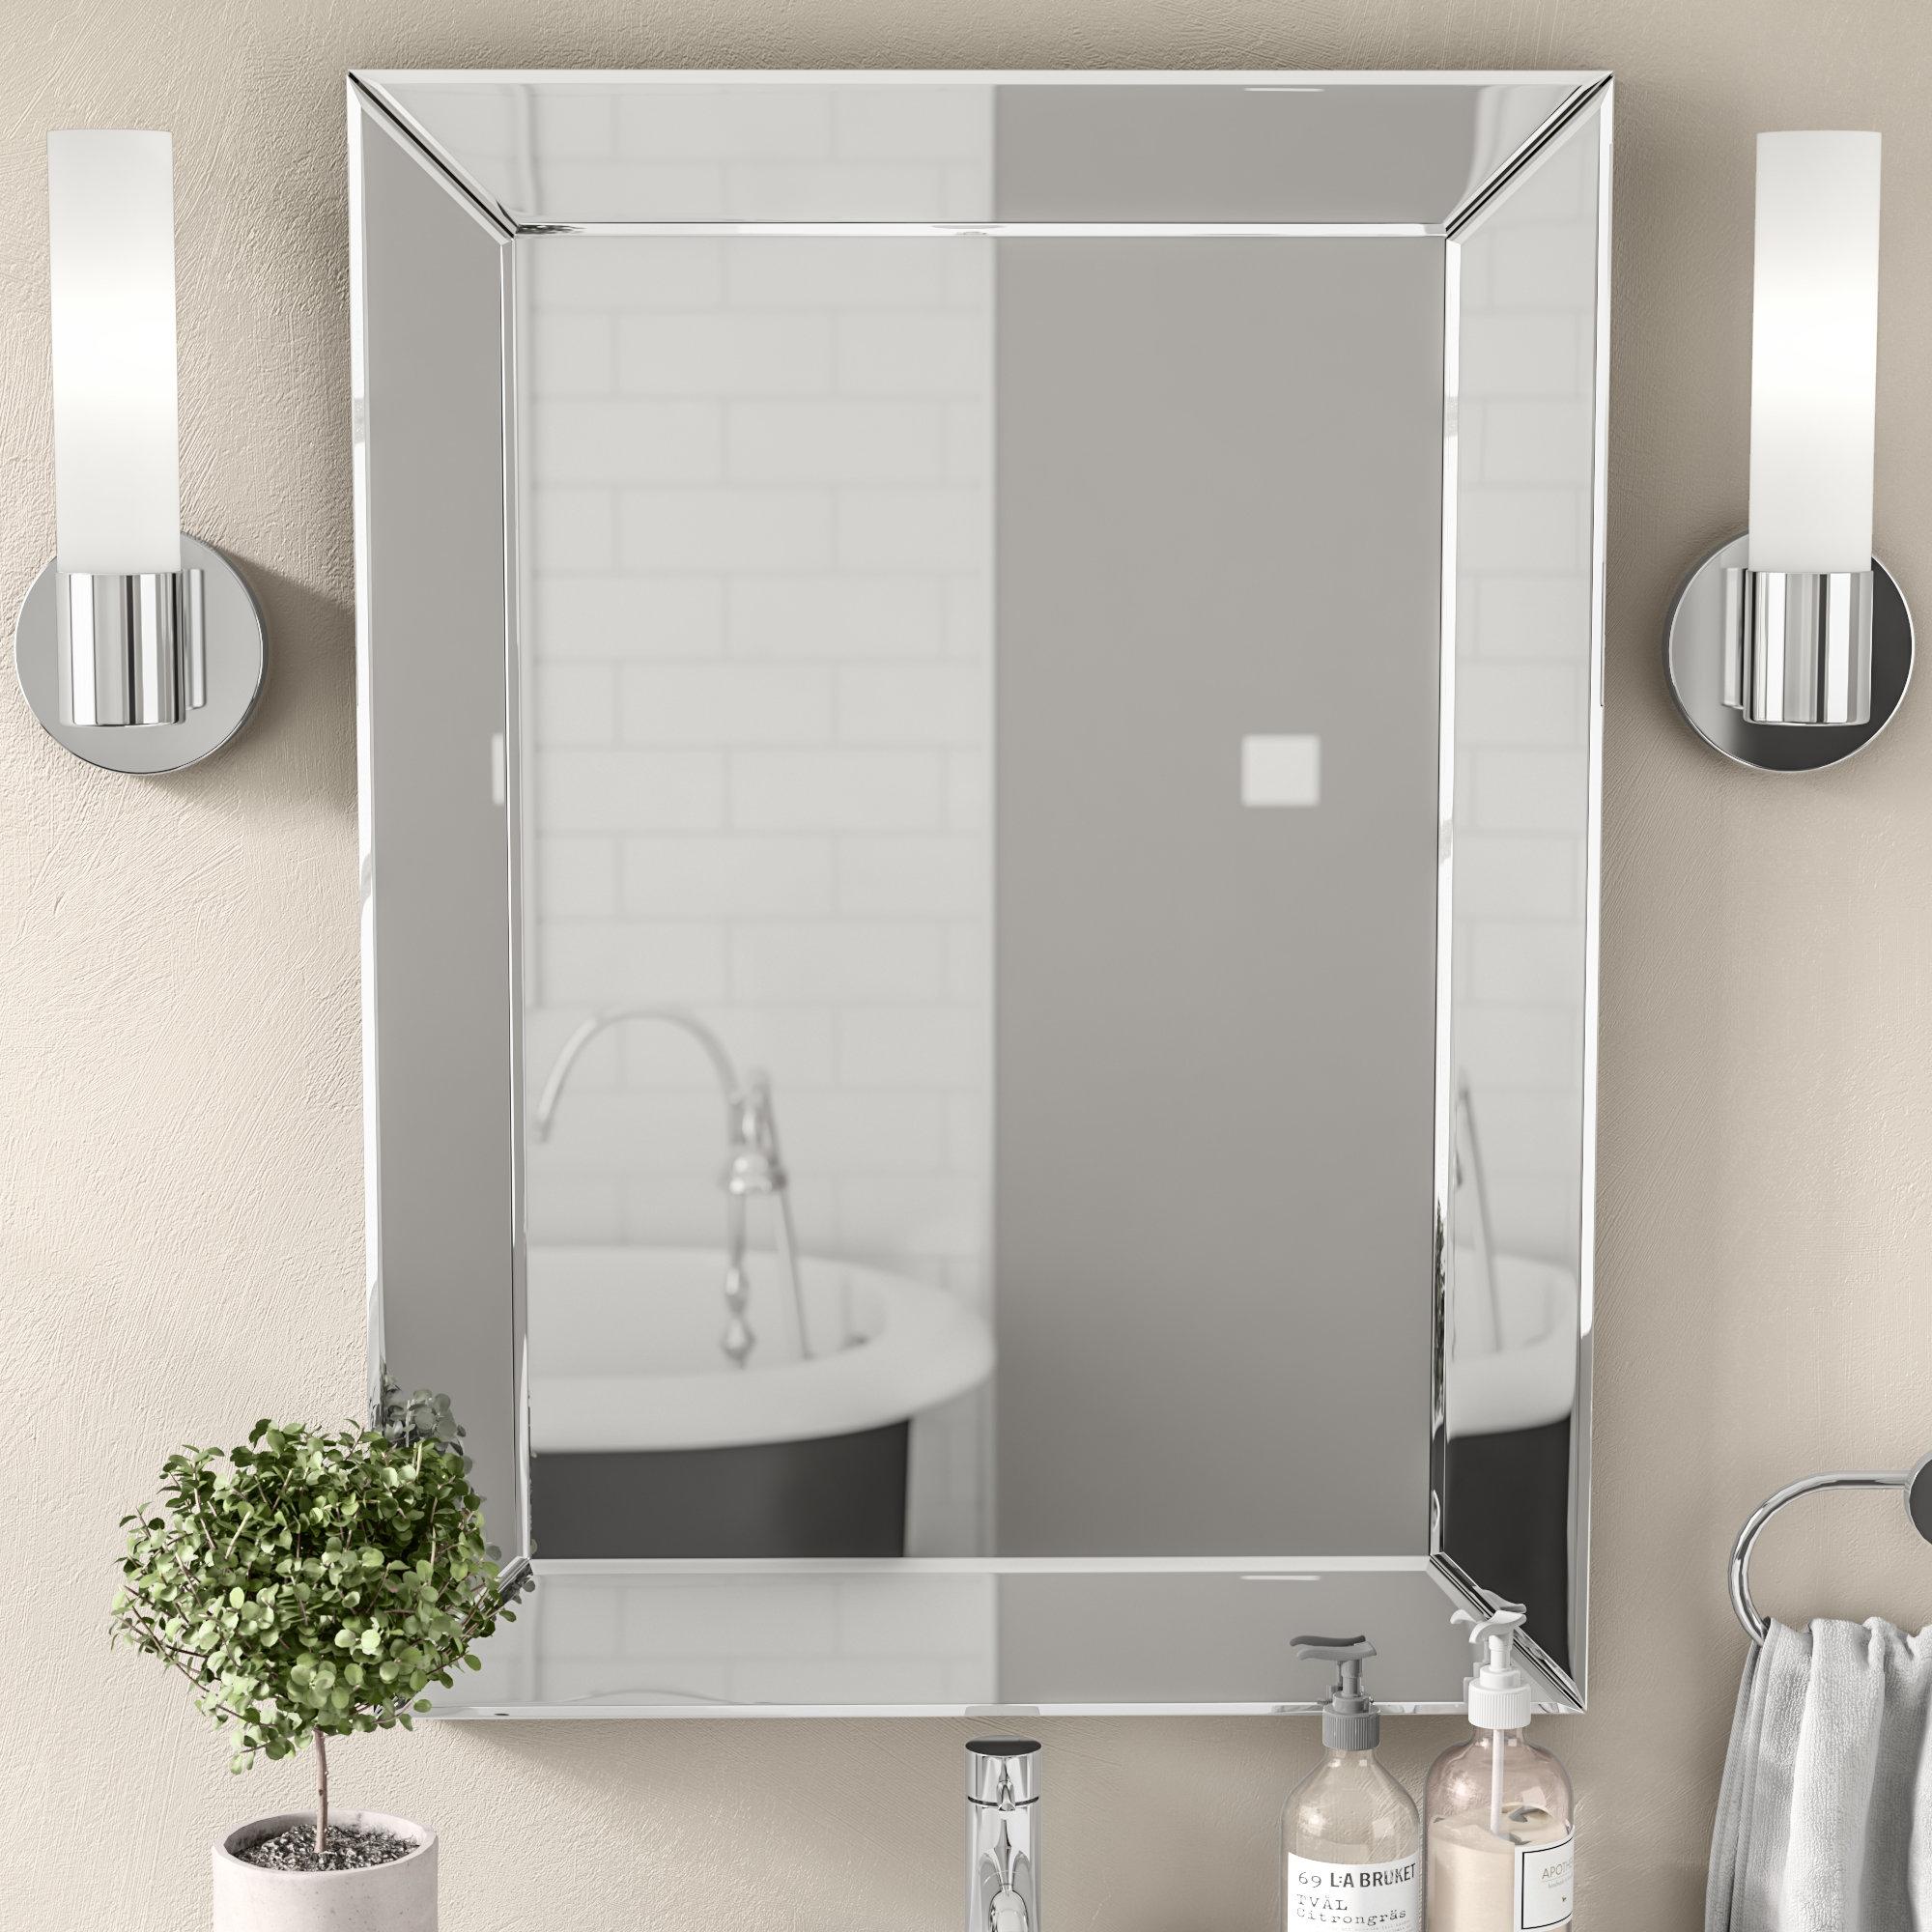 Modern & Contemporary Rattan Rectangular Mirror | Allmodern with regard to Pennsburg Rectangle Wall Mirrors (Image 13 of 30)